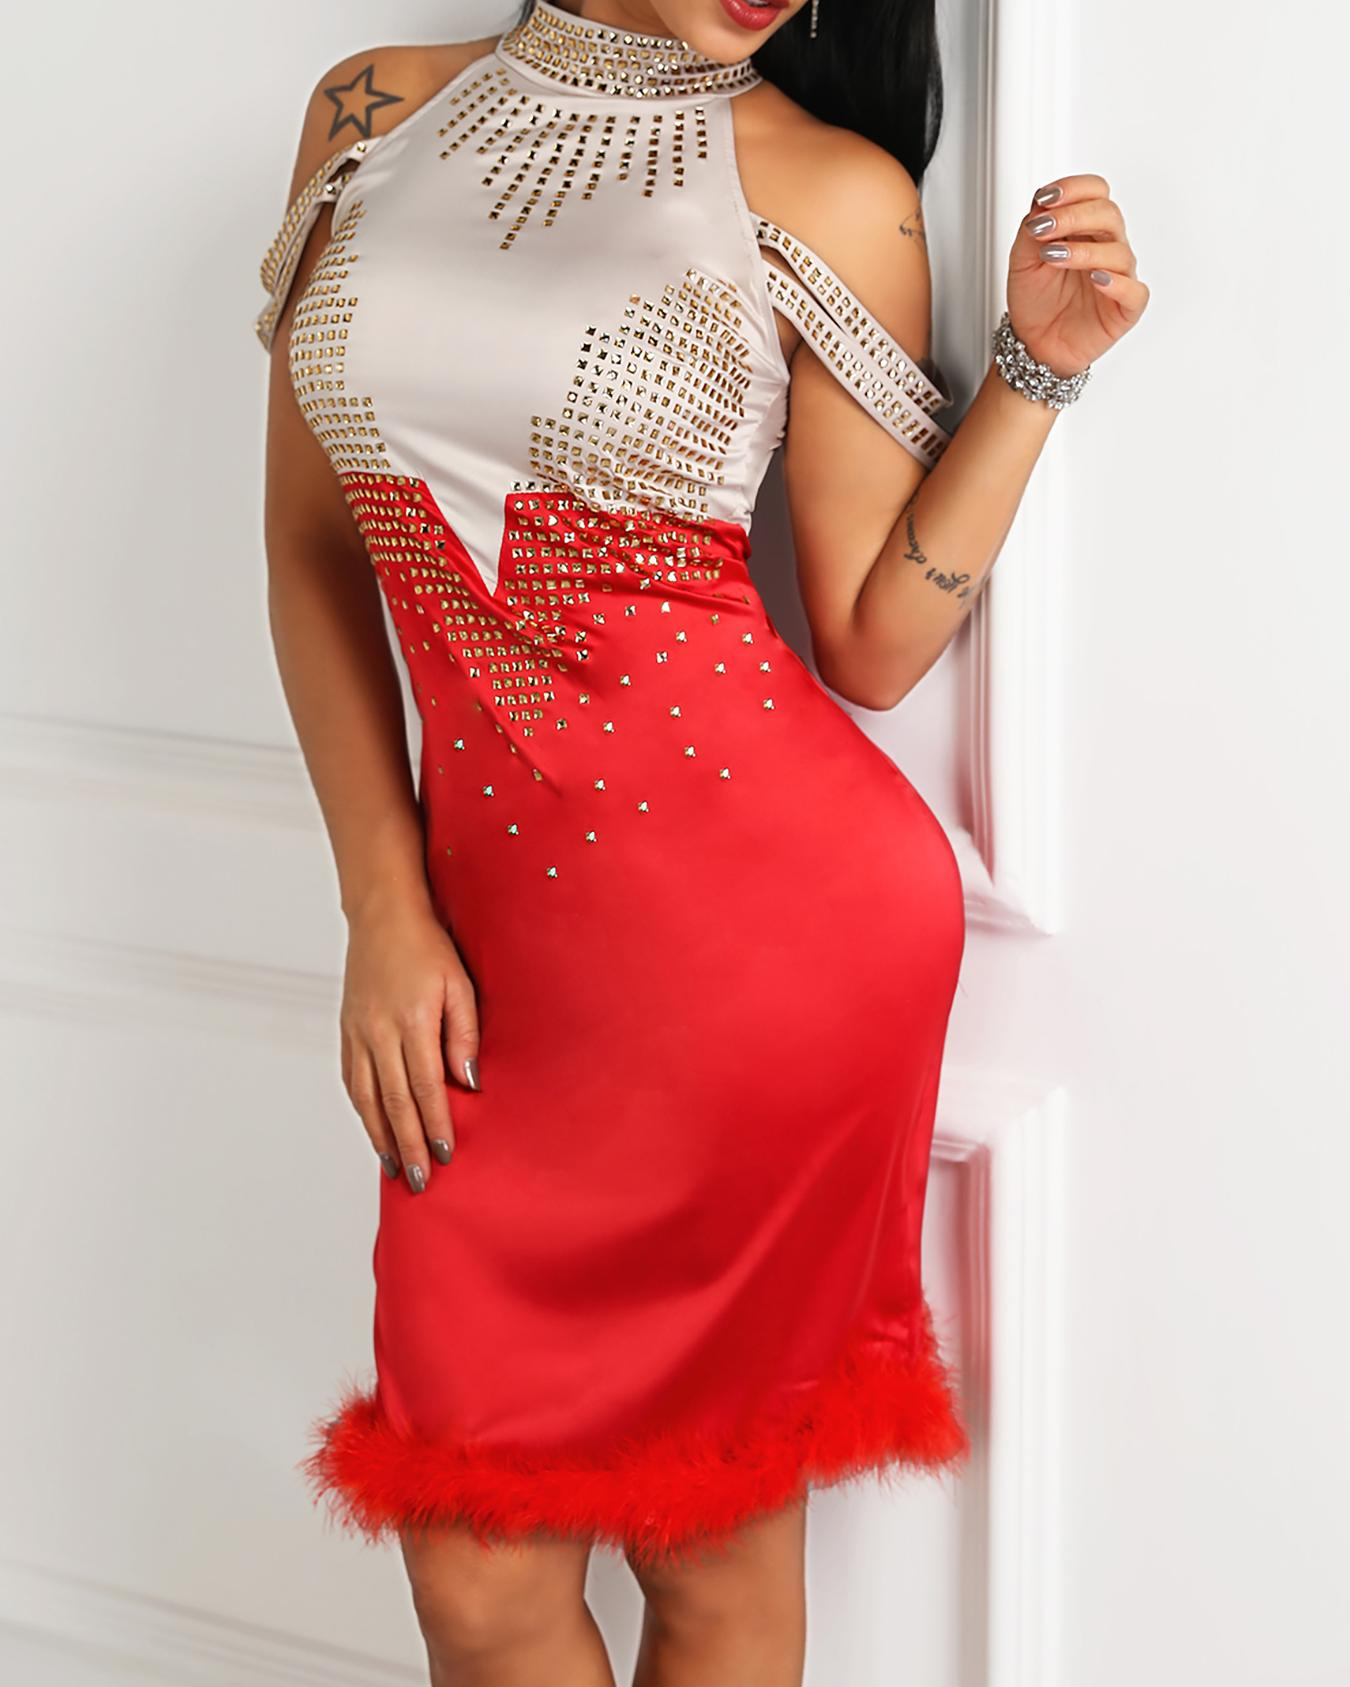 Hot Drilling Fluffy Embellished Party Dress